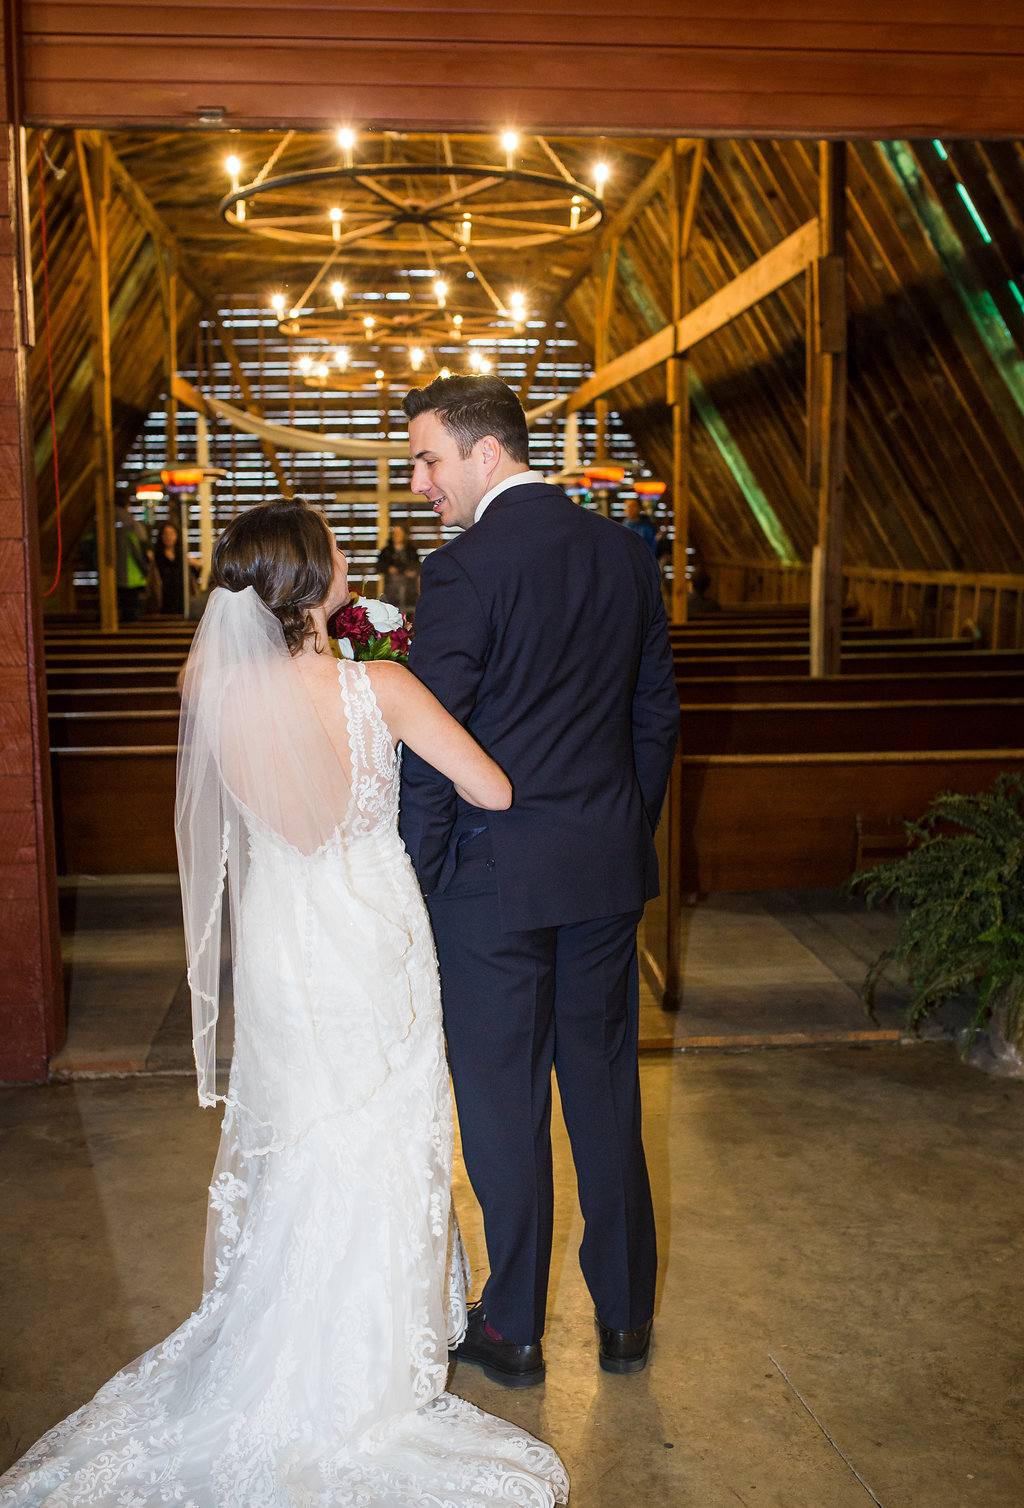 Honeysuckle-Hill-Asheville-Wedding-Venue-Chase-Chris-Elopement-155.JPG